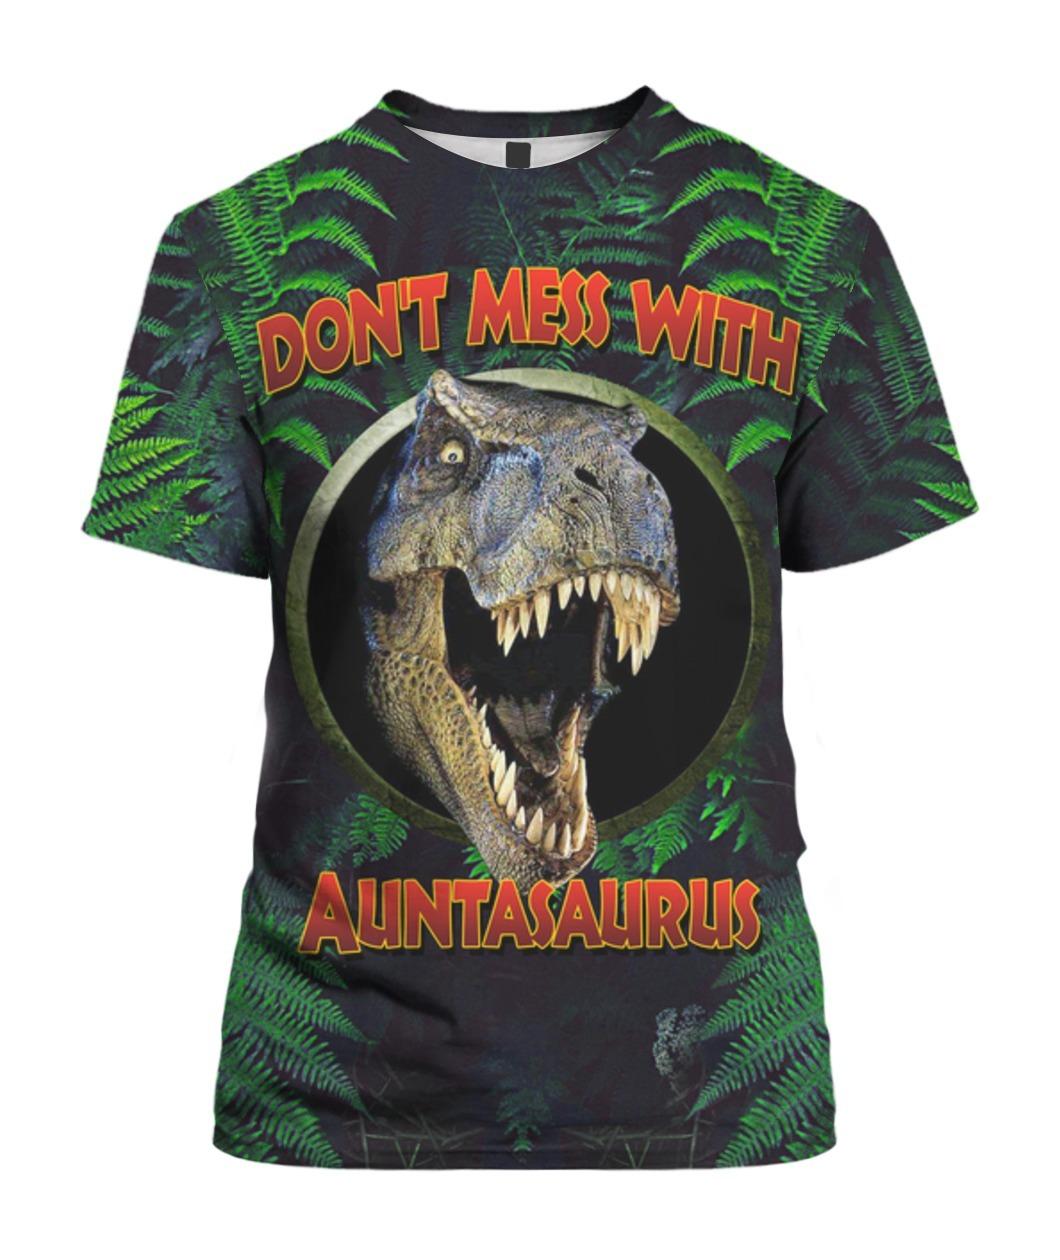 Dont mess with auntasaurus overprint 3d shirt -BBS